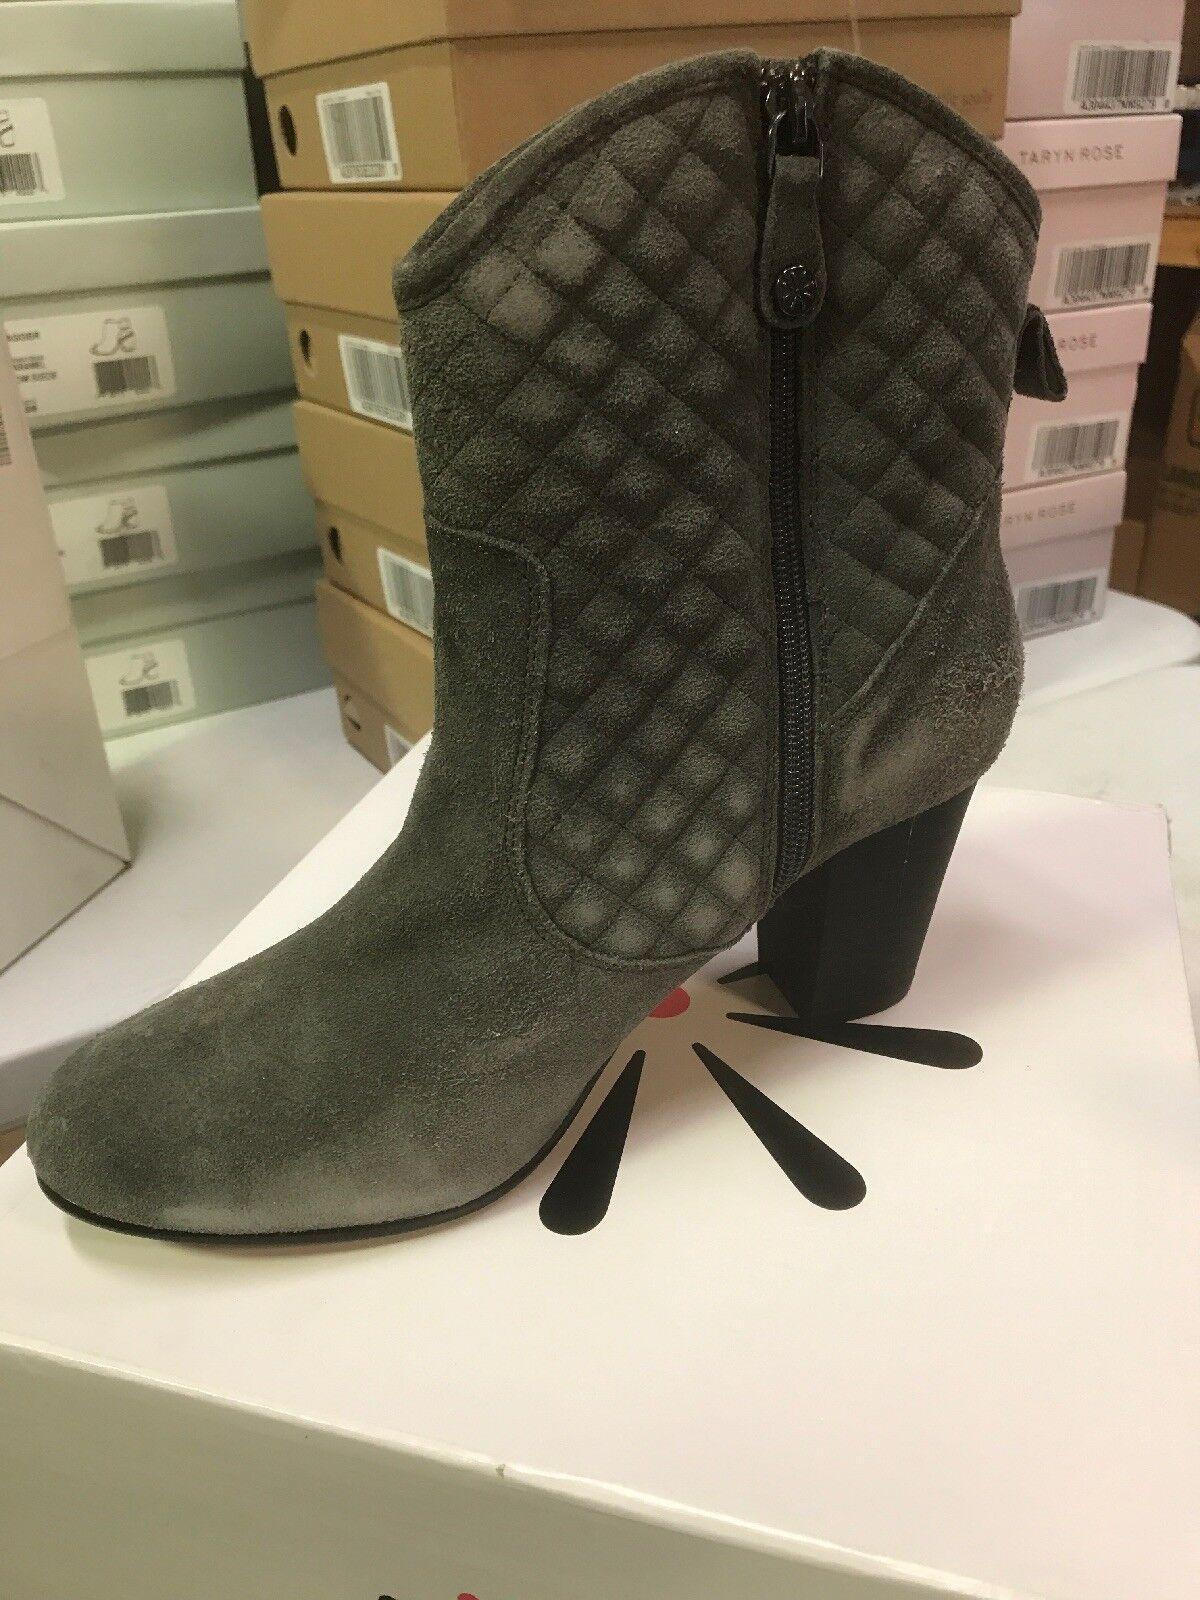 Isaac Mizrahi Live  botas de gamuza tacón apilados Acolchado gris para Mujer W Nuevo